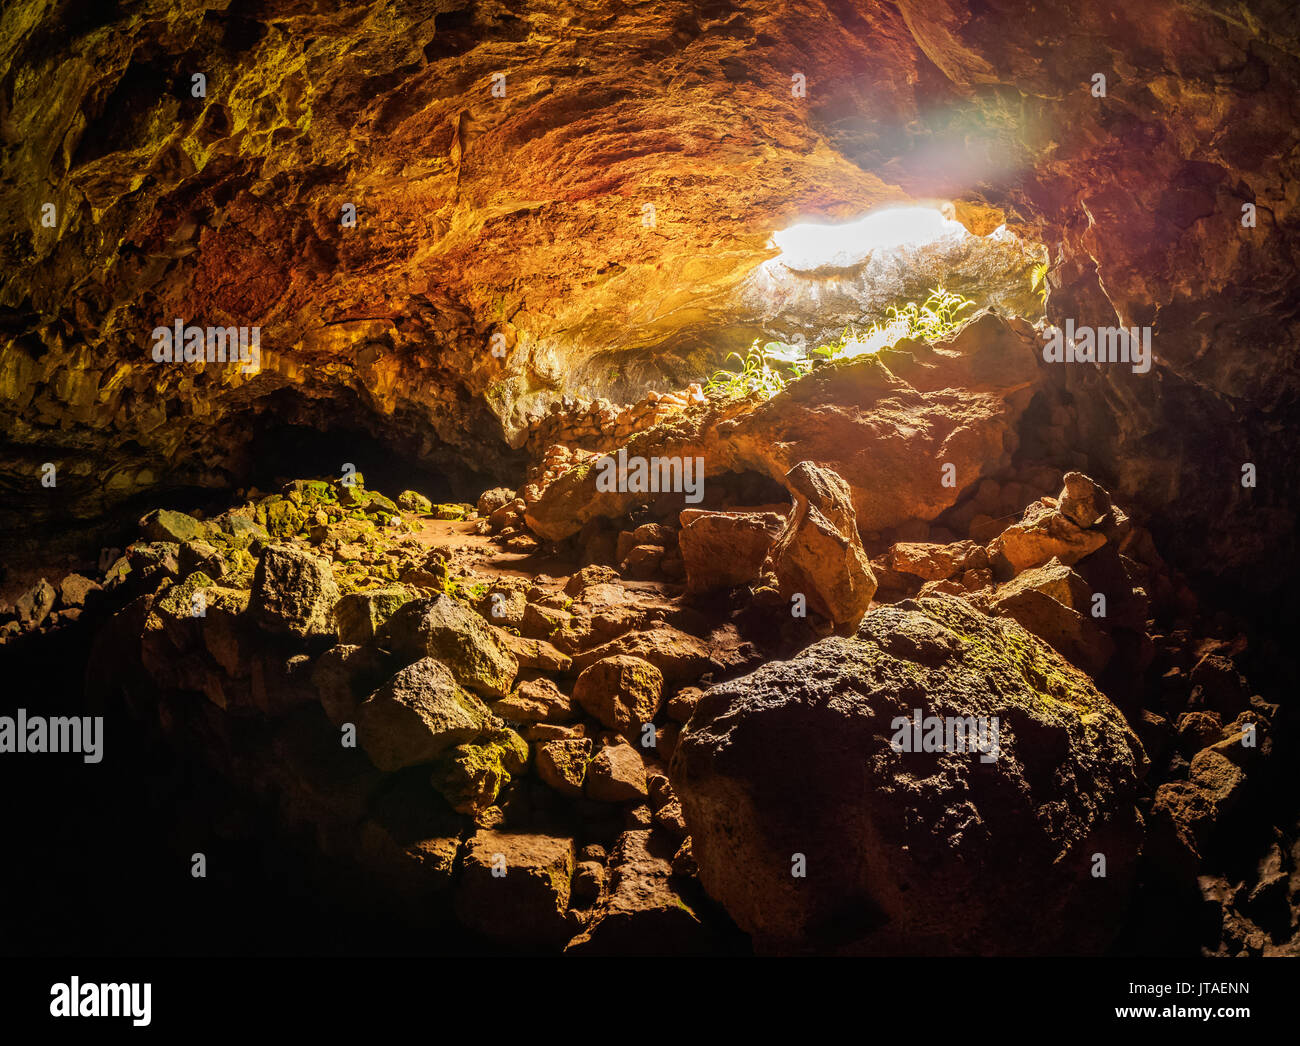 Ana Te Pahu Höhle, Rapa Nui Nationalpark, UNESCO-Weltkulturerbe, Easter Island, Chile Stockbild